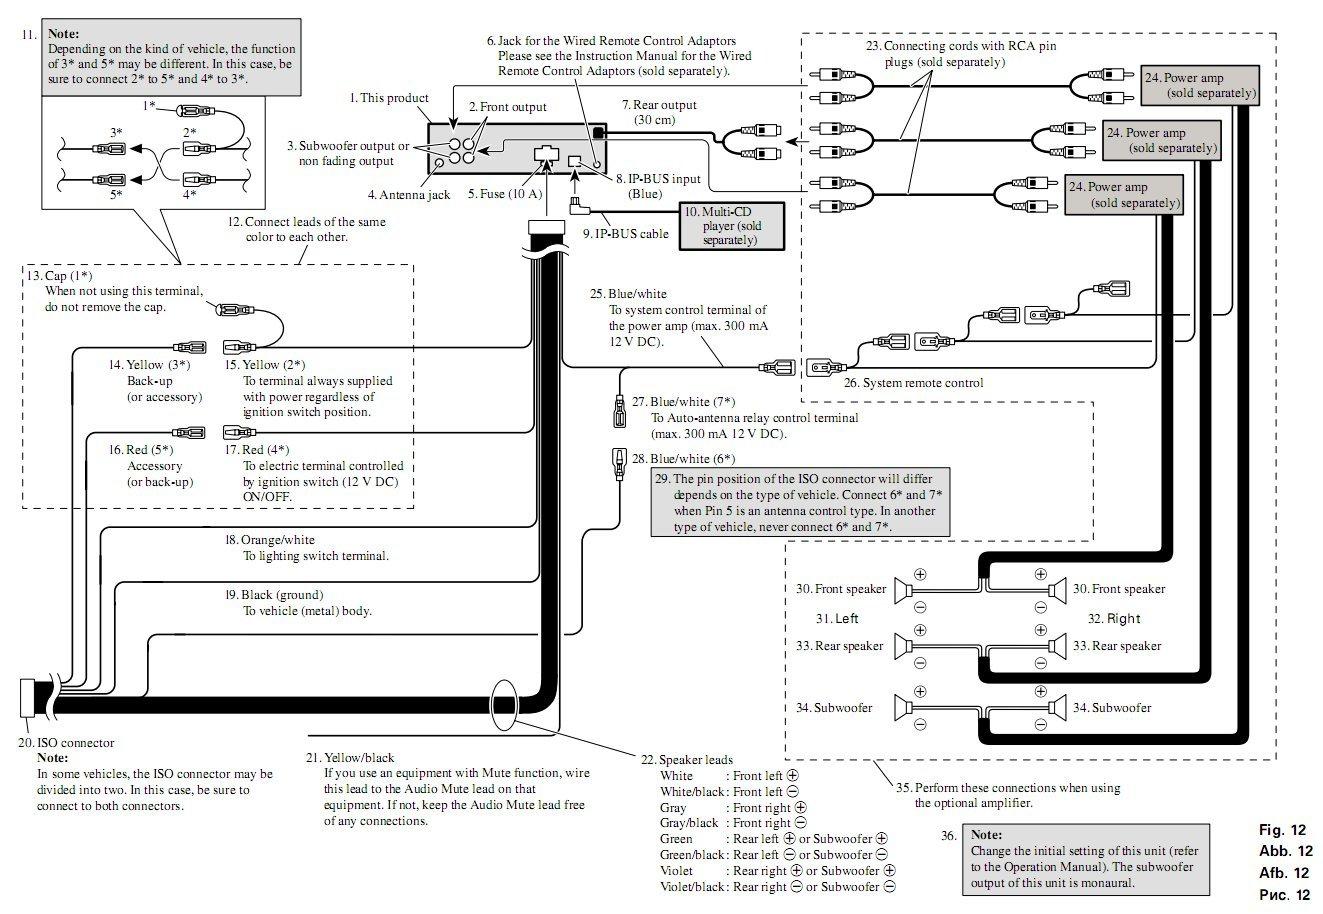 DIAGRAM] Wiring Diagram Pioneer Deh 6100 Installation FULL Version HD  Quality 6100 Installation - 1HOAWIRING1.LALIBRAIRIEDELOUVIERS.FR1hoawiring1.lalibrairiedelouviers.fr